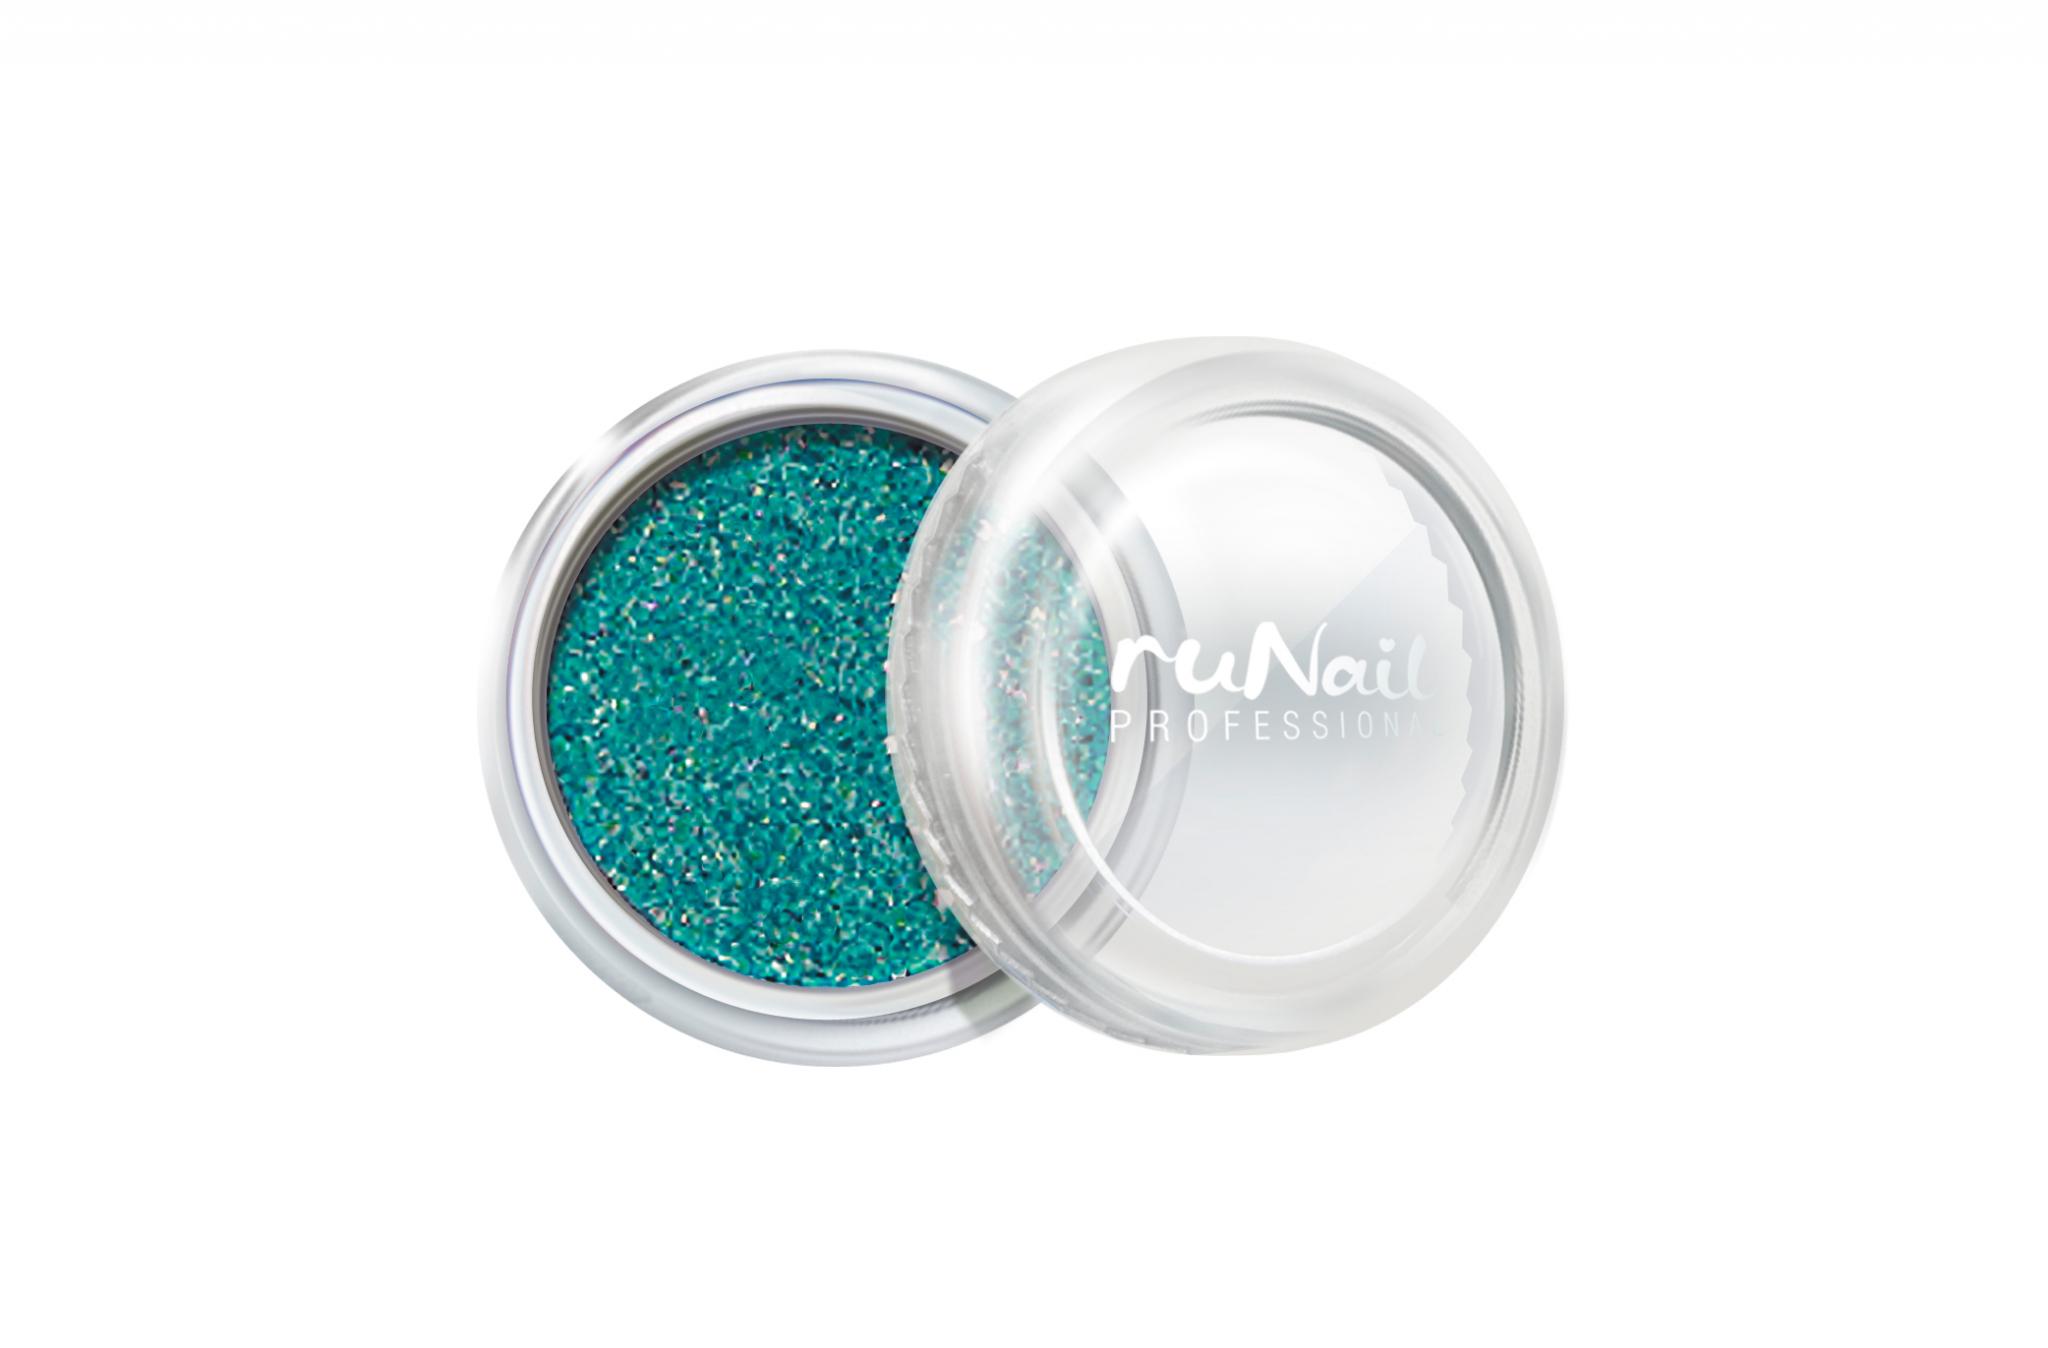 Дизайн для ногтей: зеркальная пыль №4303